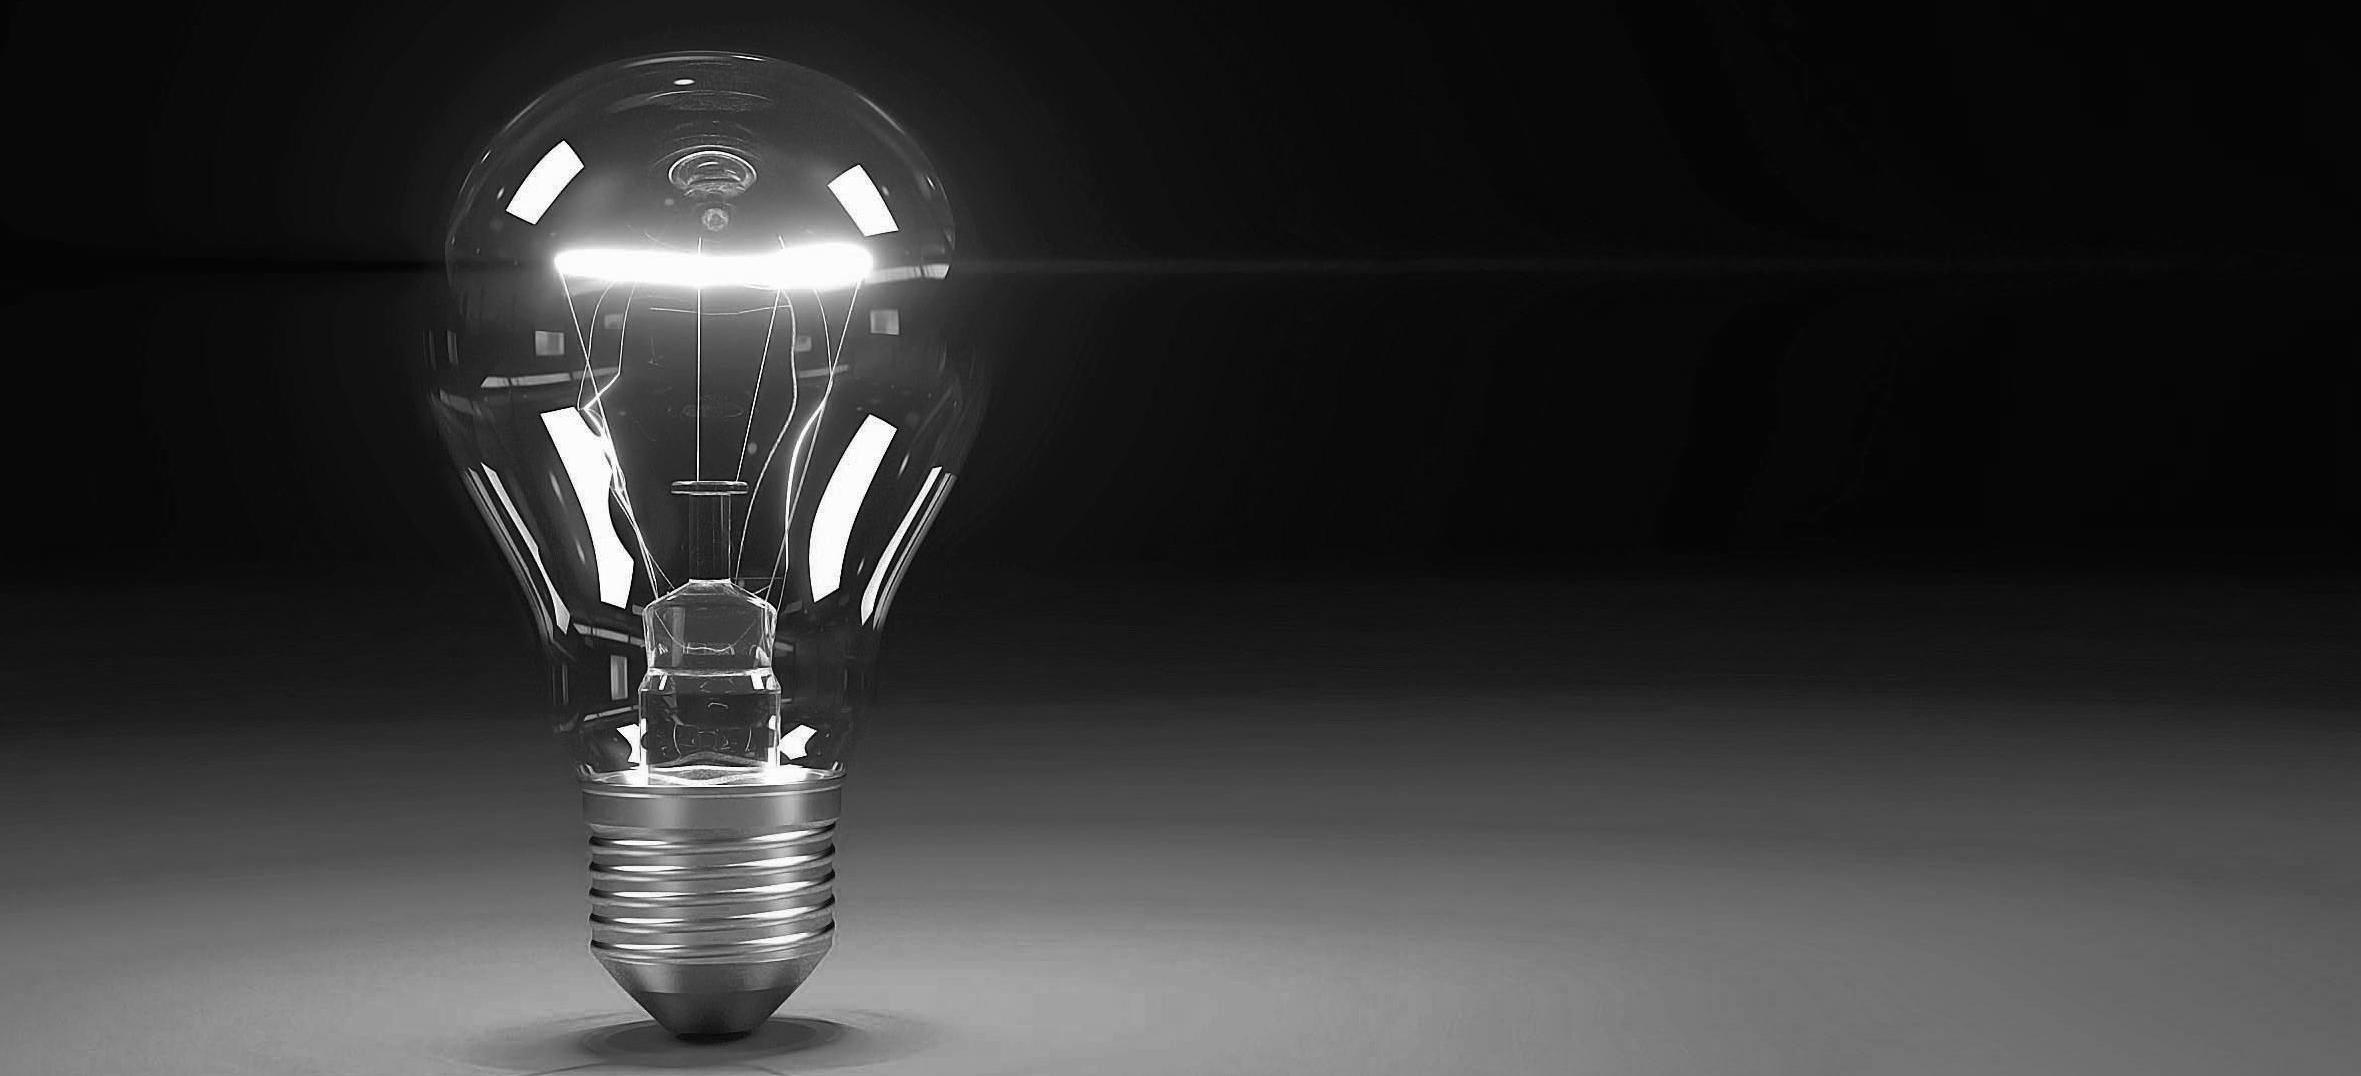 Lightbulb new ideas concepts trends